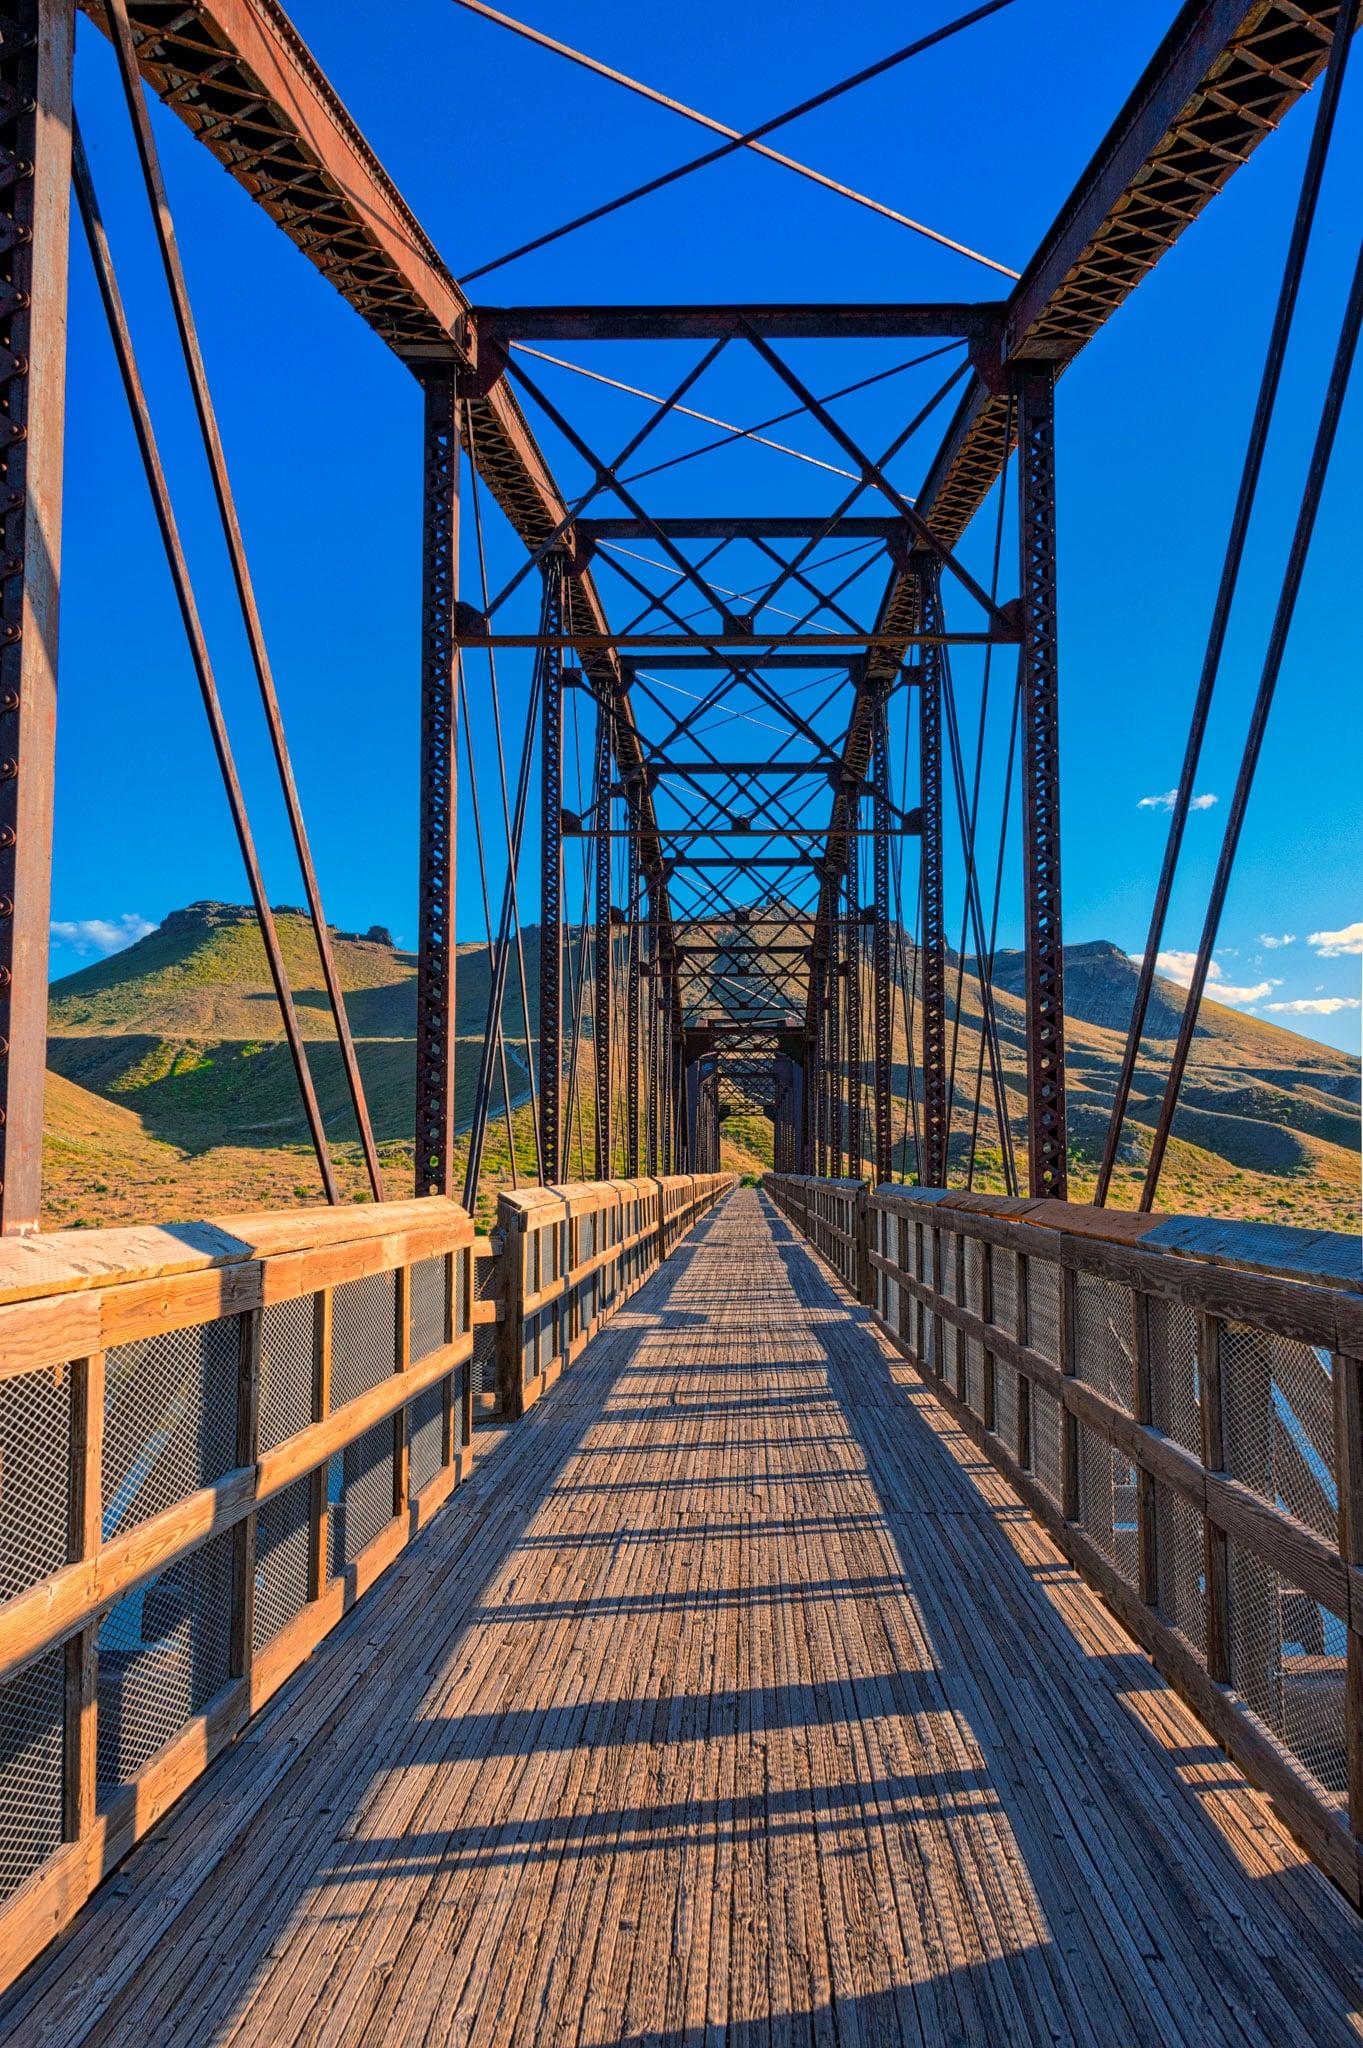 Guffey Bridge is a Parker-Through-Truss Railroad Bridge that is now used as a footbridge across the Snake River in Celebration Park near Melba, Idaho.